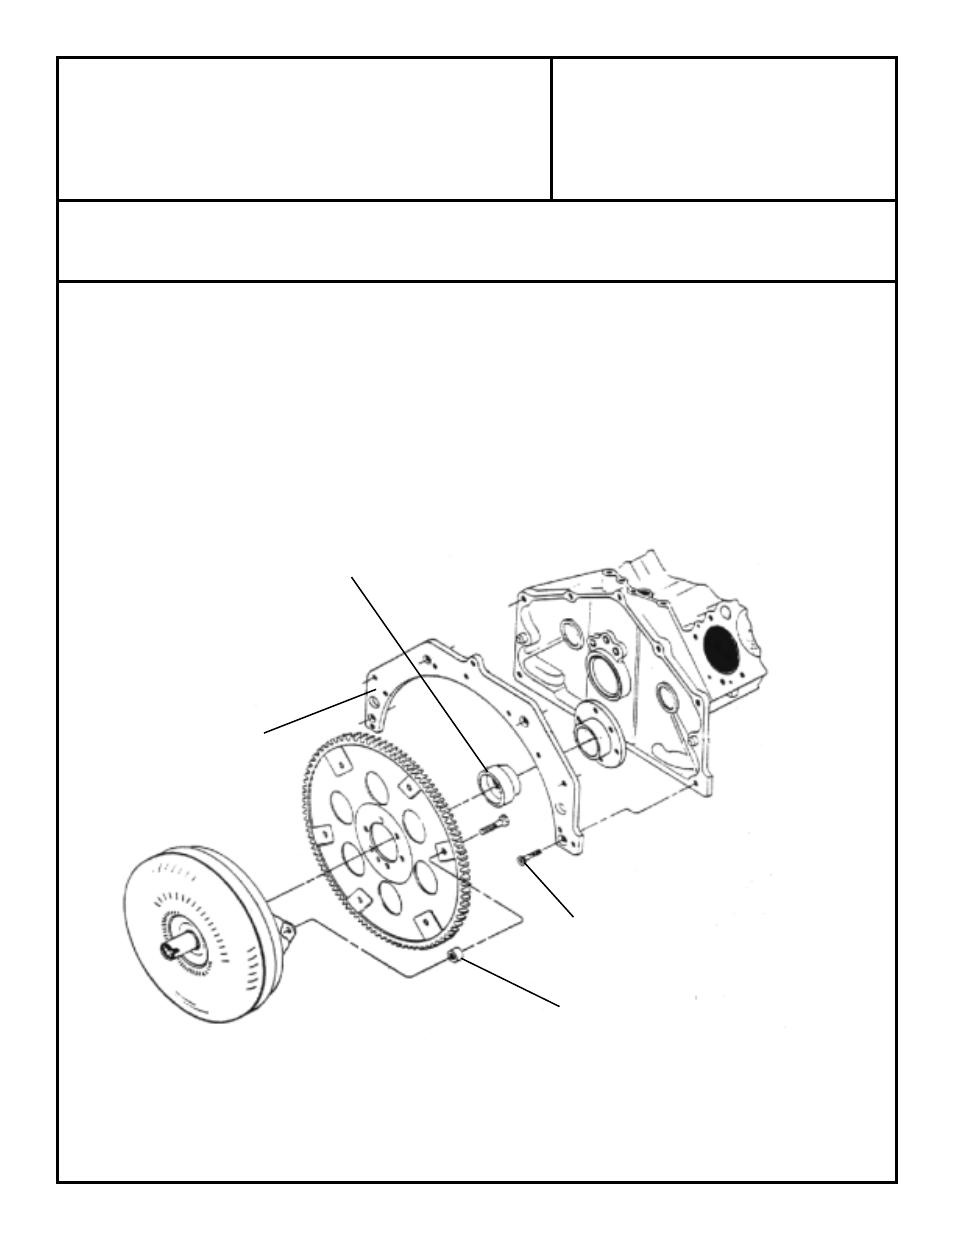 medium resolution of chevy turbo 400 diagram